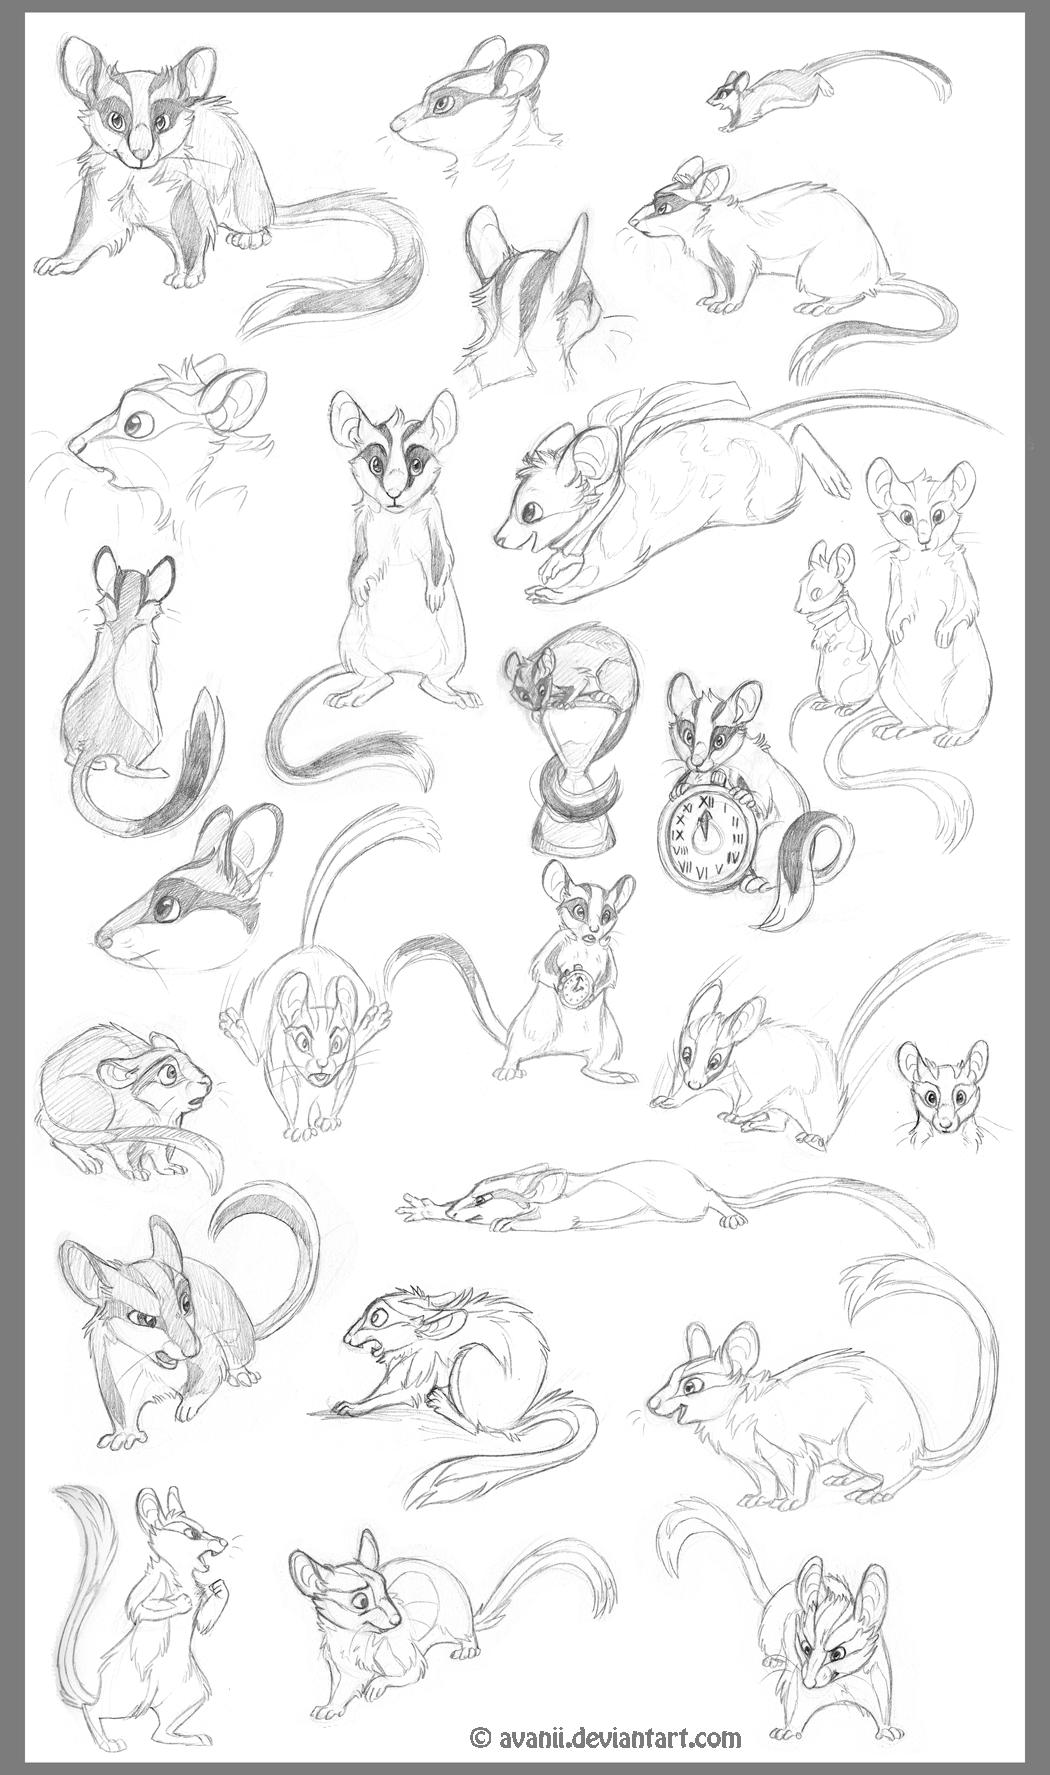 Sketchdump: Mortimer by Avanii